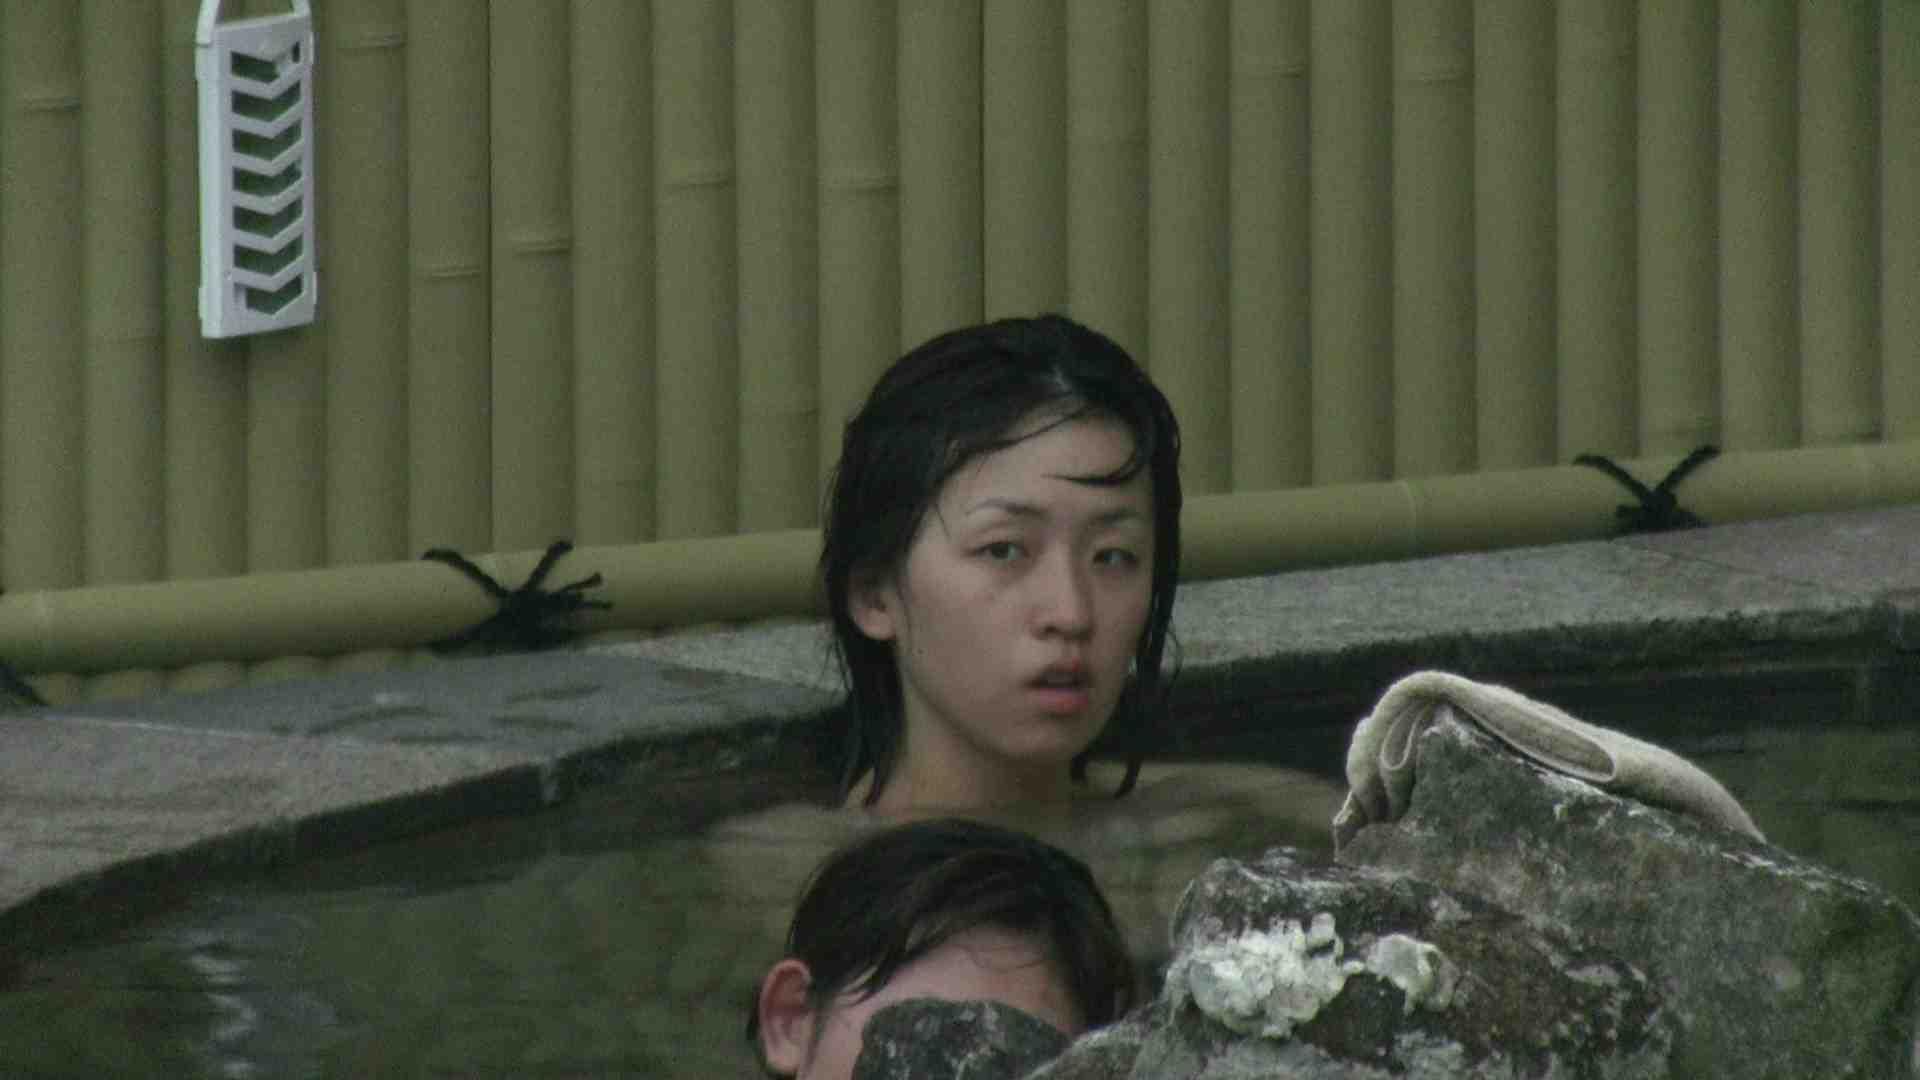 Aquaな露天風呂Vol.170 0  65連発 24